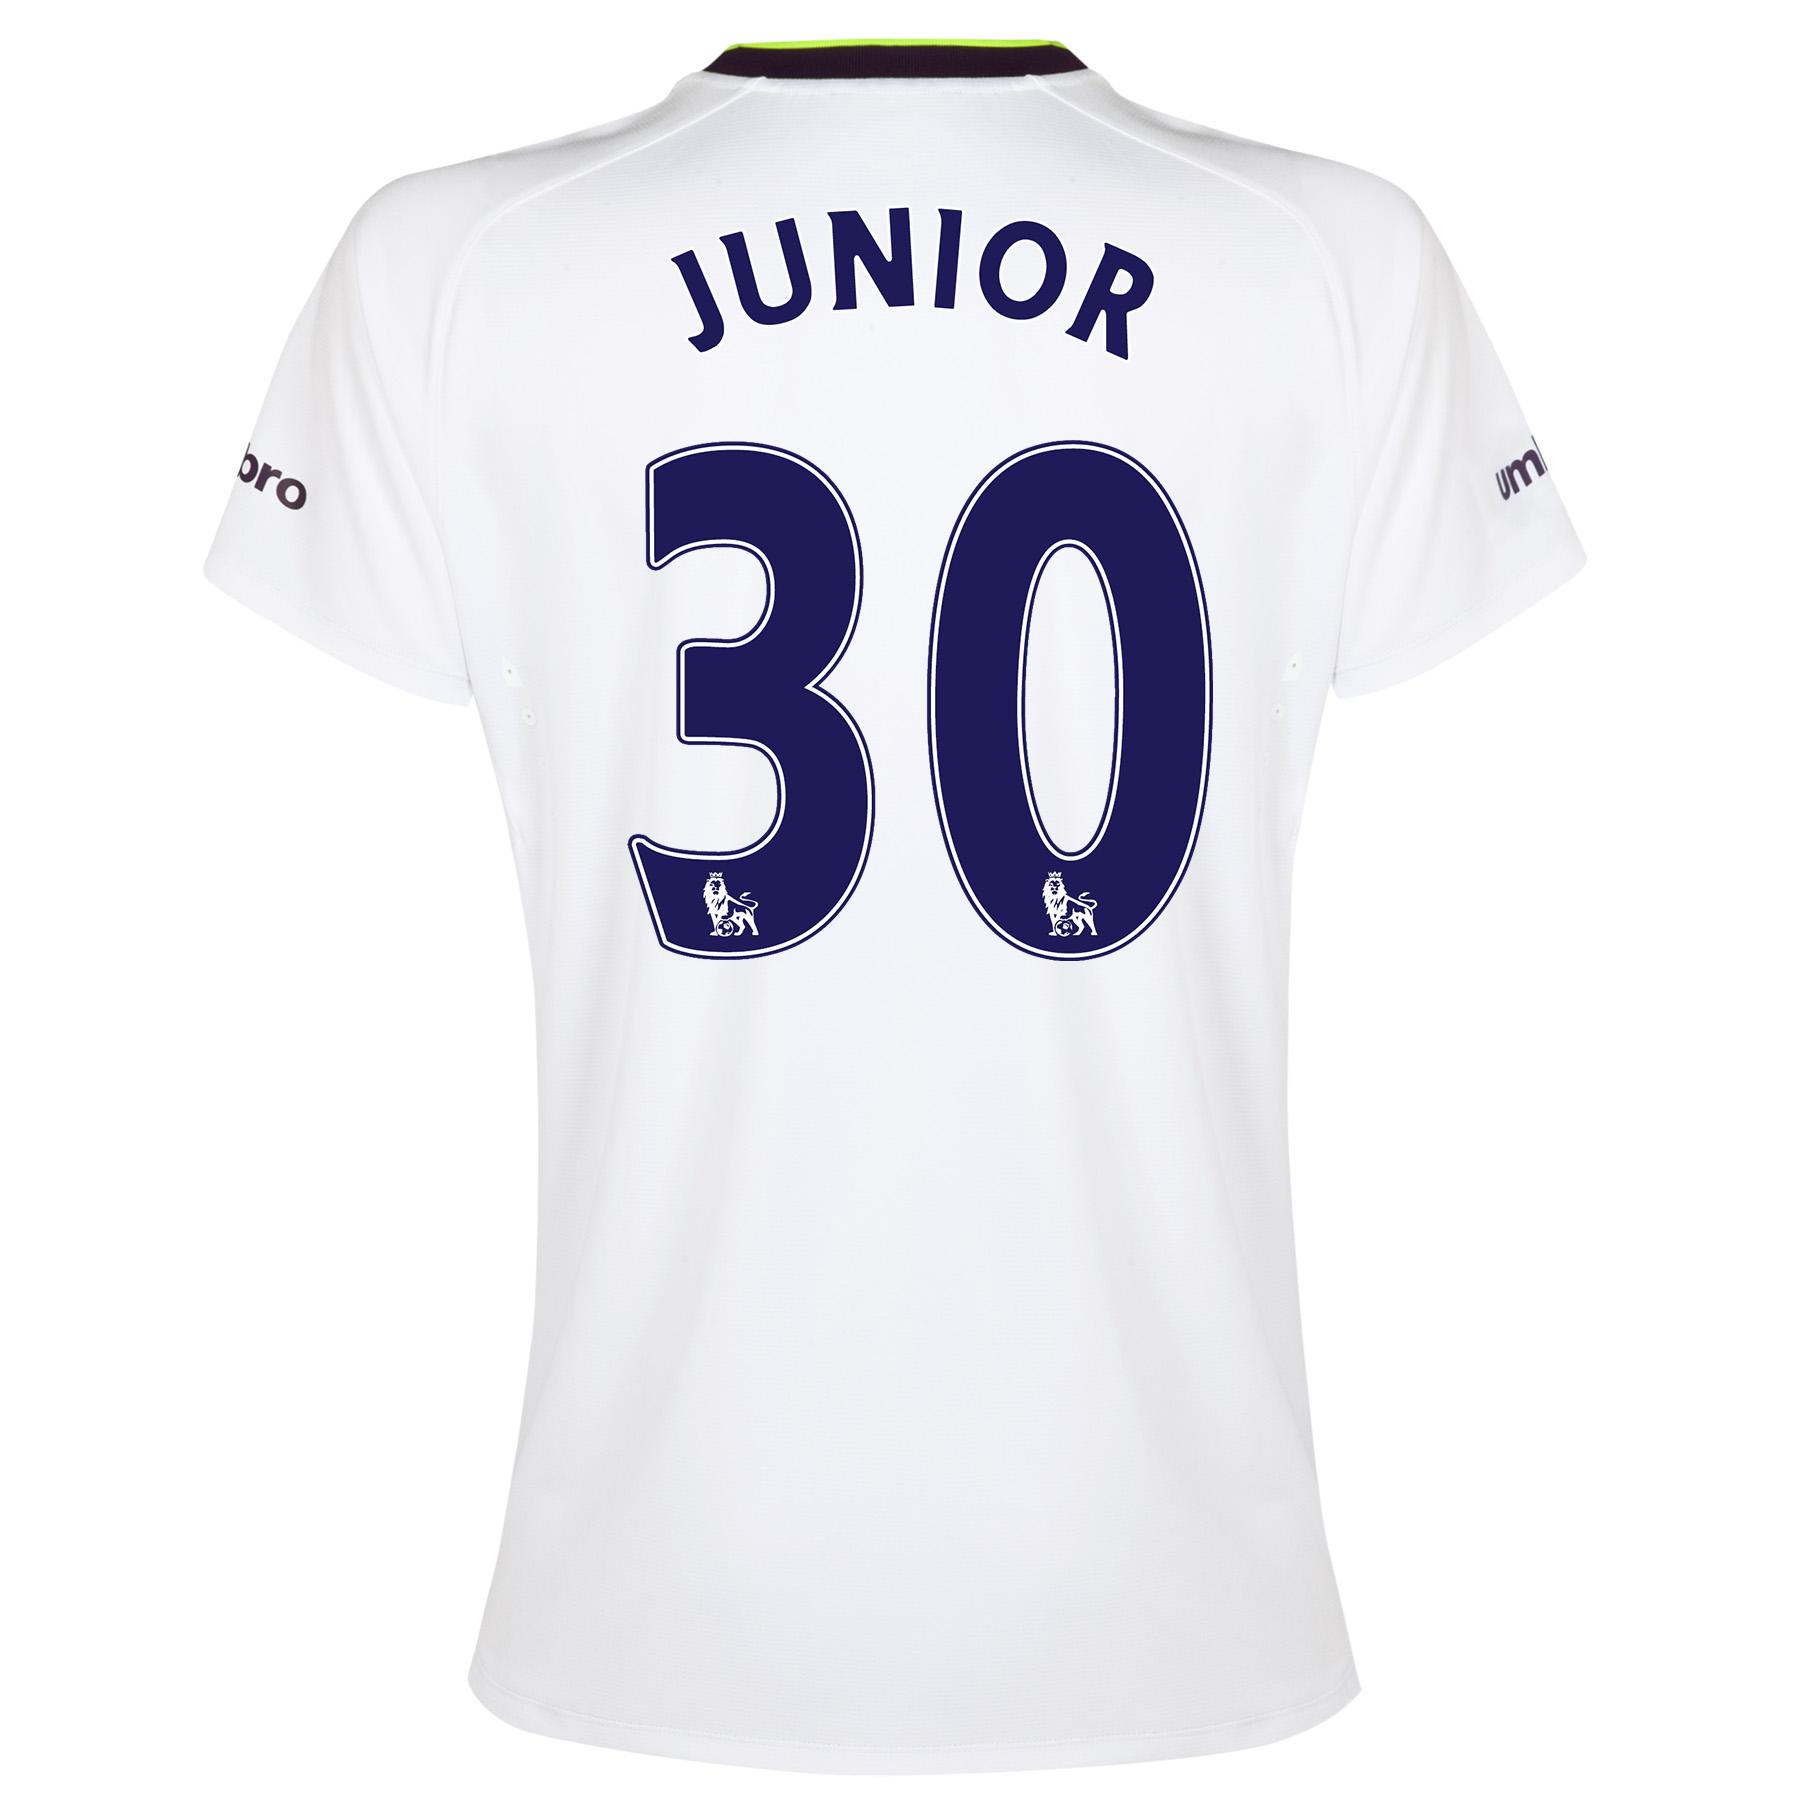 Everton SS 3rd Shirt 2014/15- Womens with Junior 30 printing